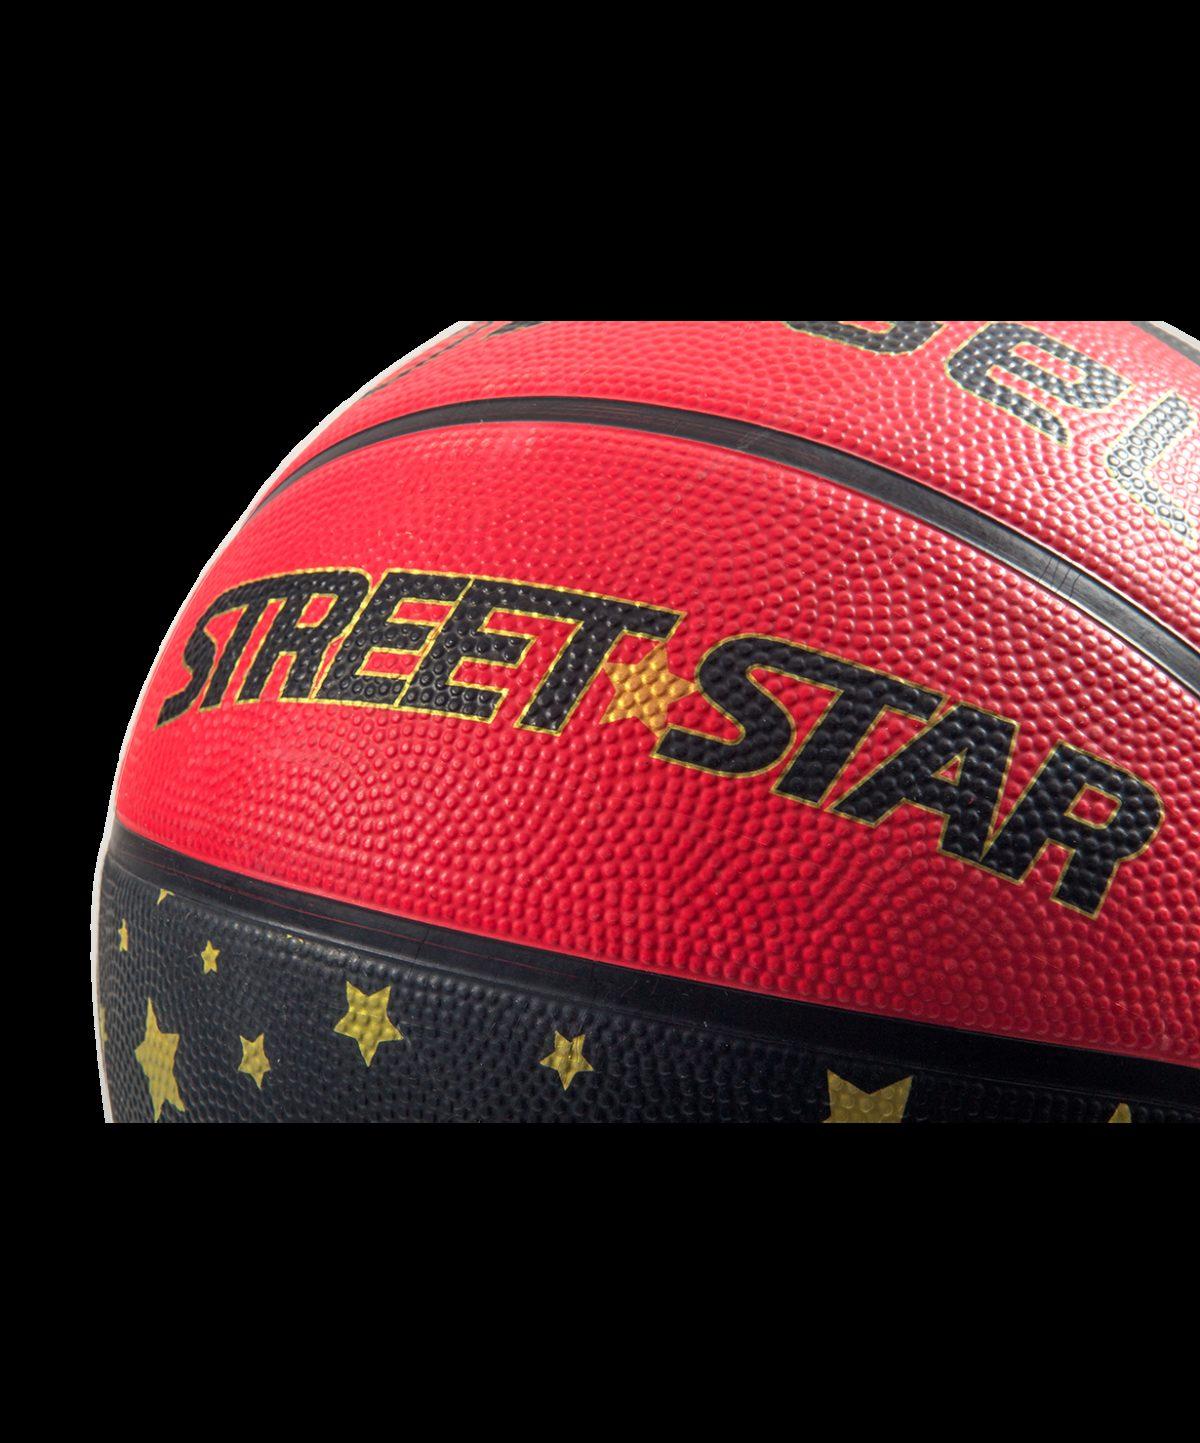 JOGEL Street Star Мяч баскетбольный  SS/7-20 №7 - 3